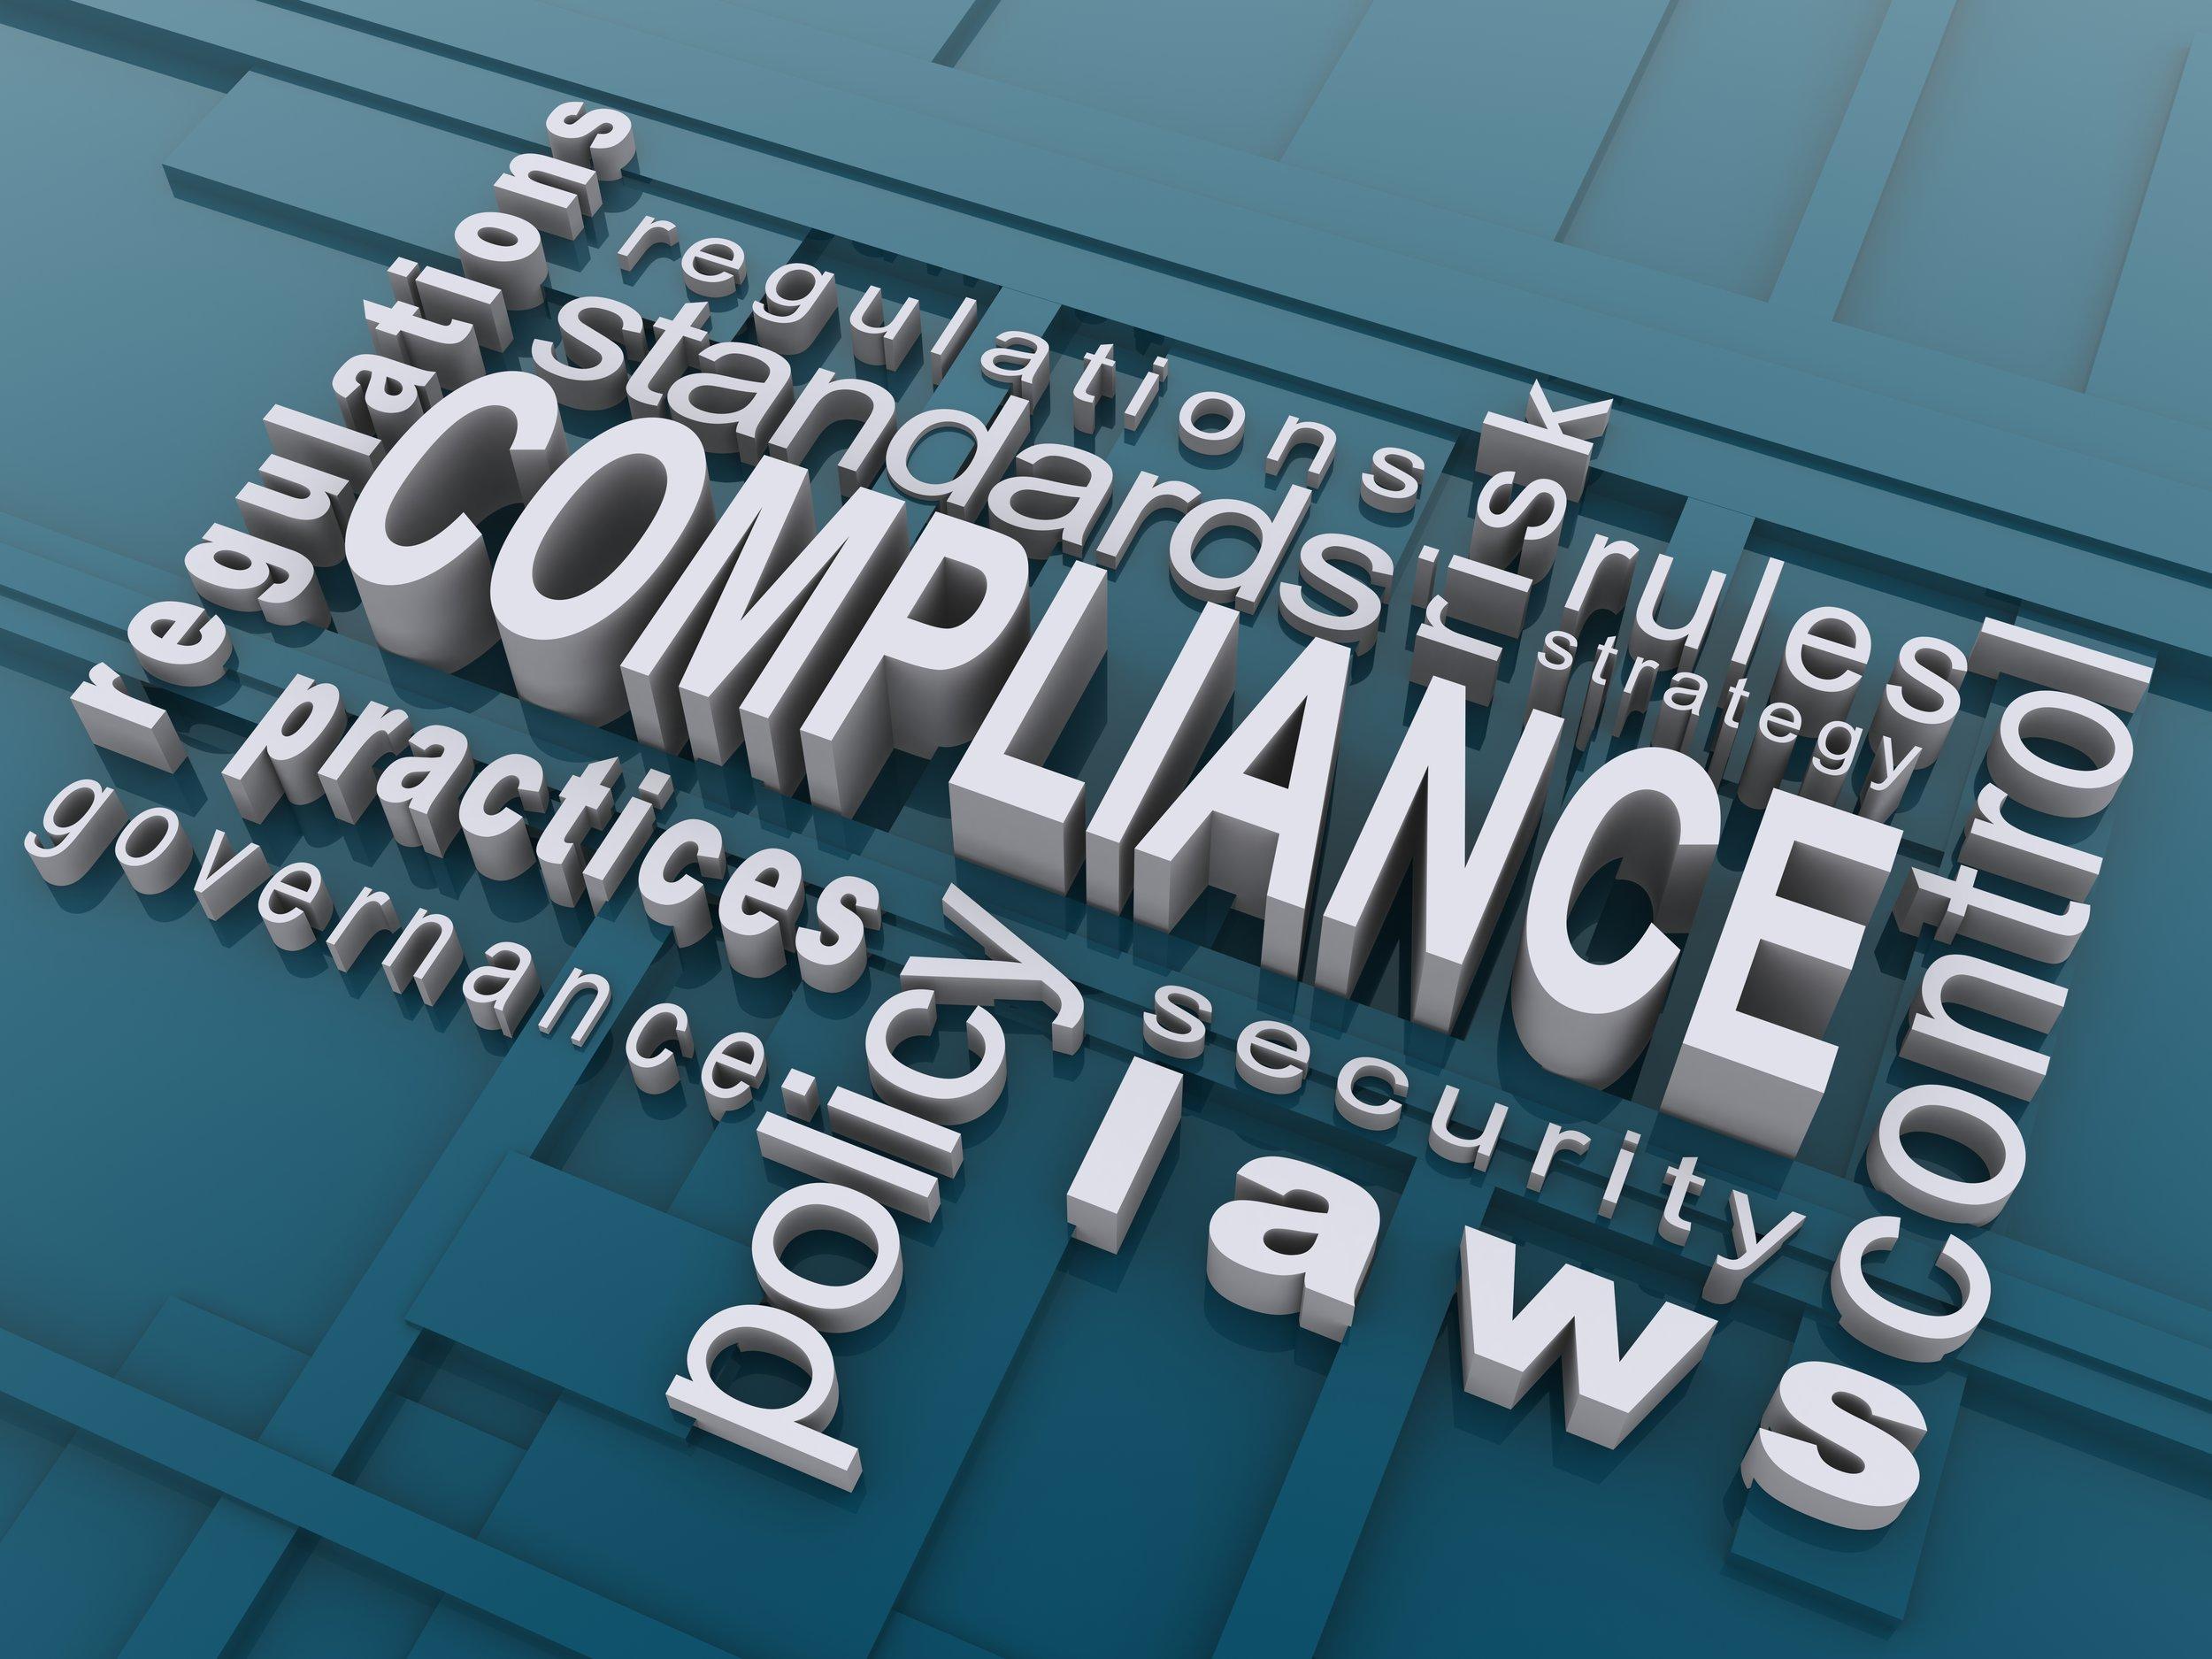 Compliance-464279115_6000x4500.jpeg